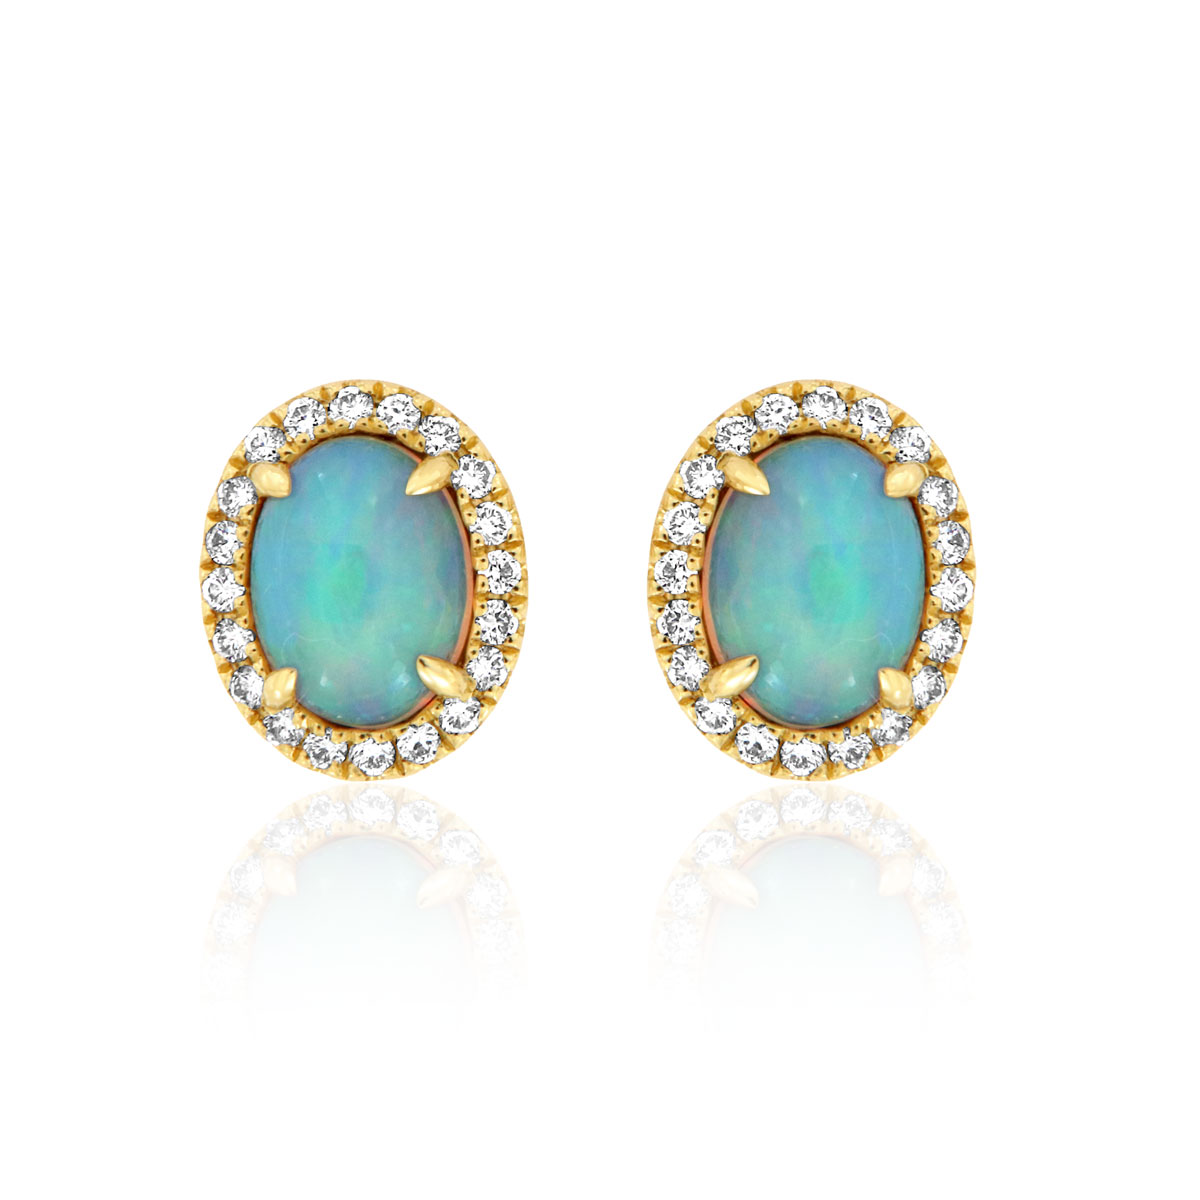 18K Yellow Gold Opal & Diamods Earrings ( 2 ct. tw)